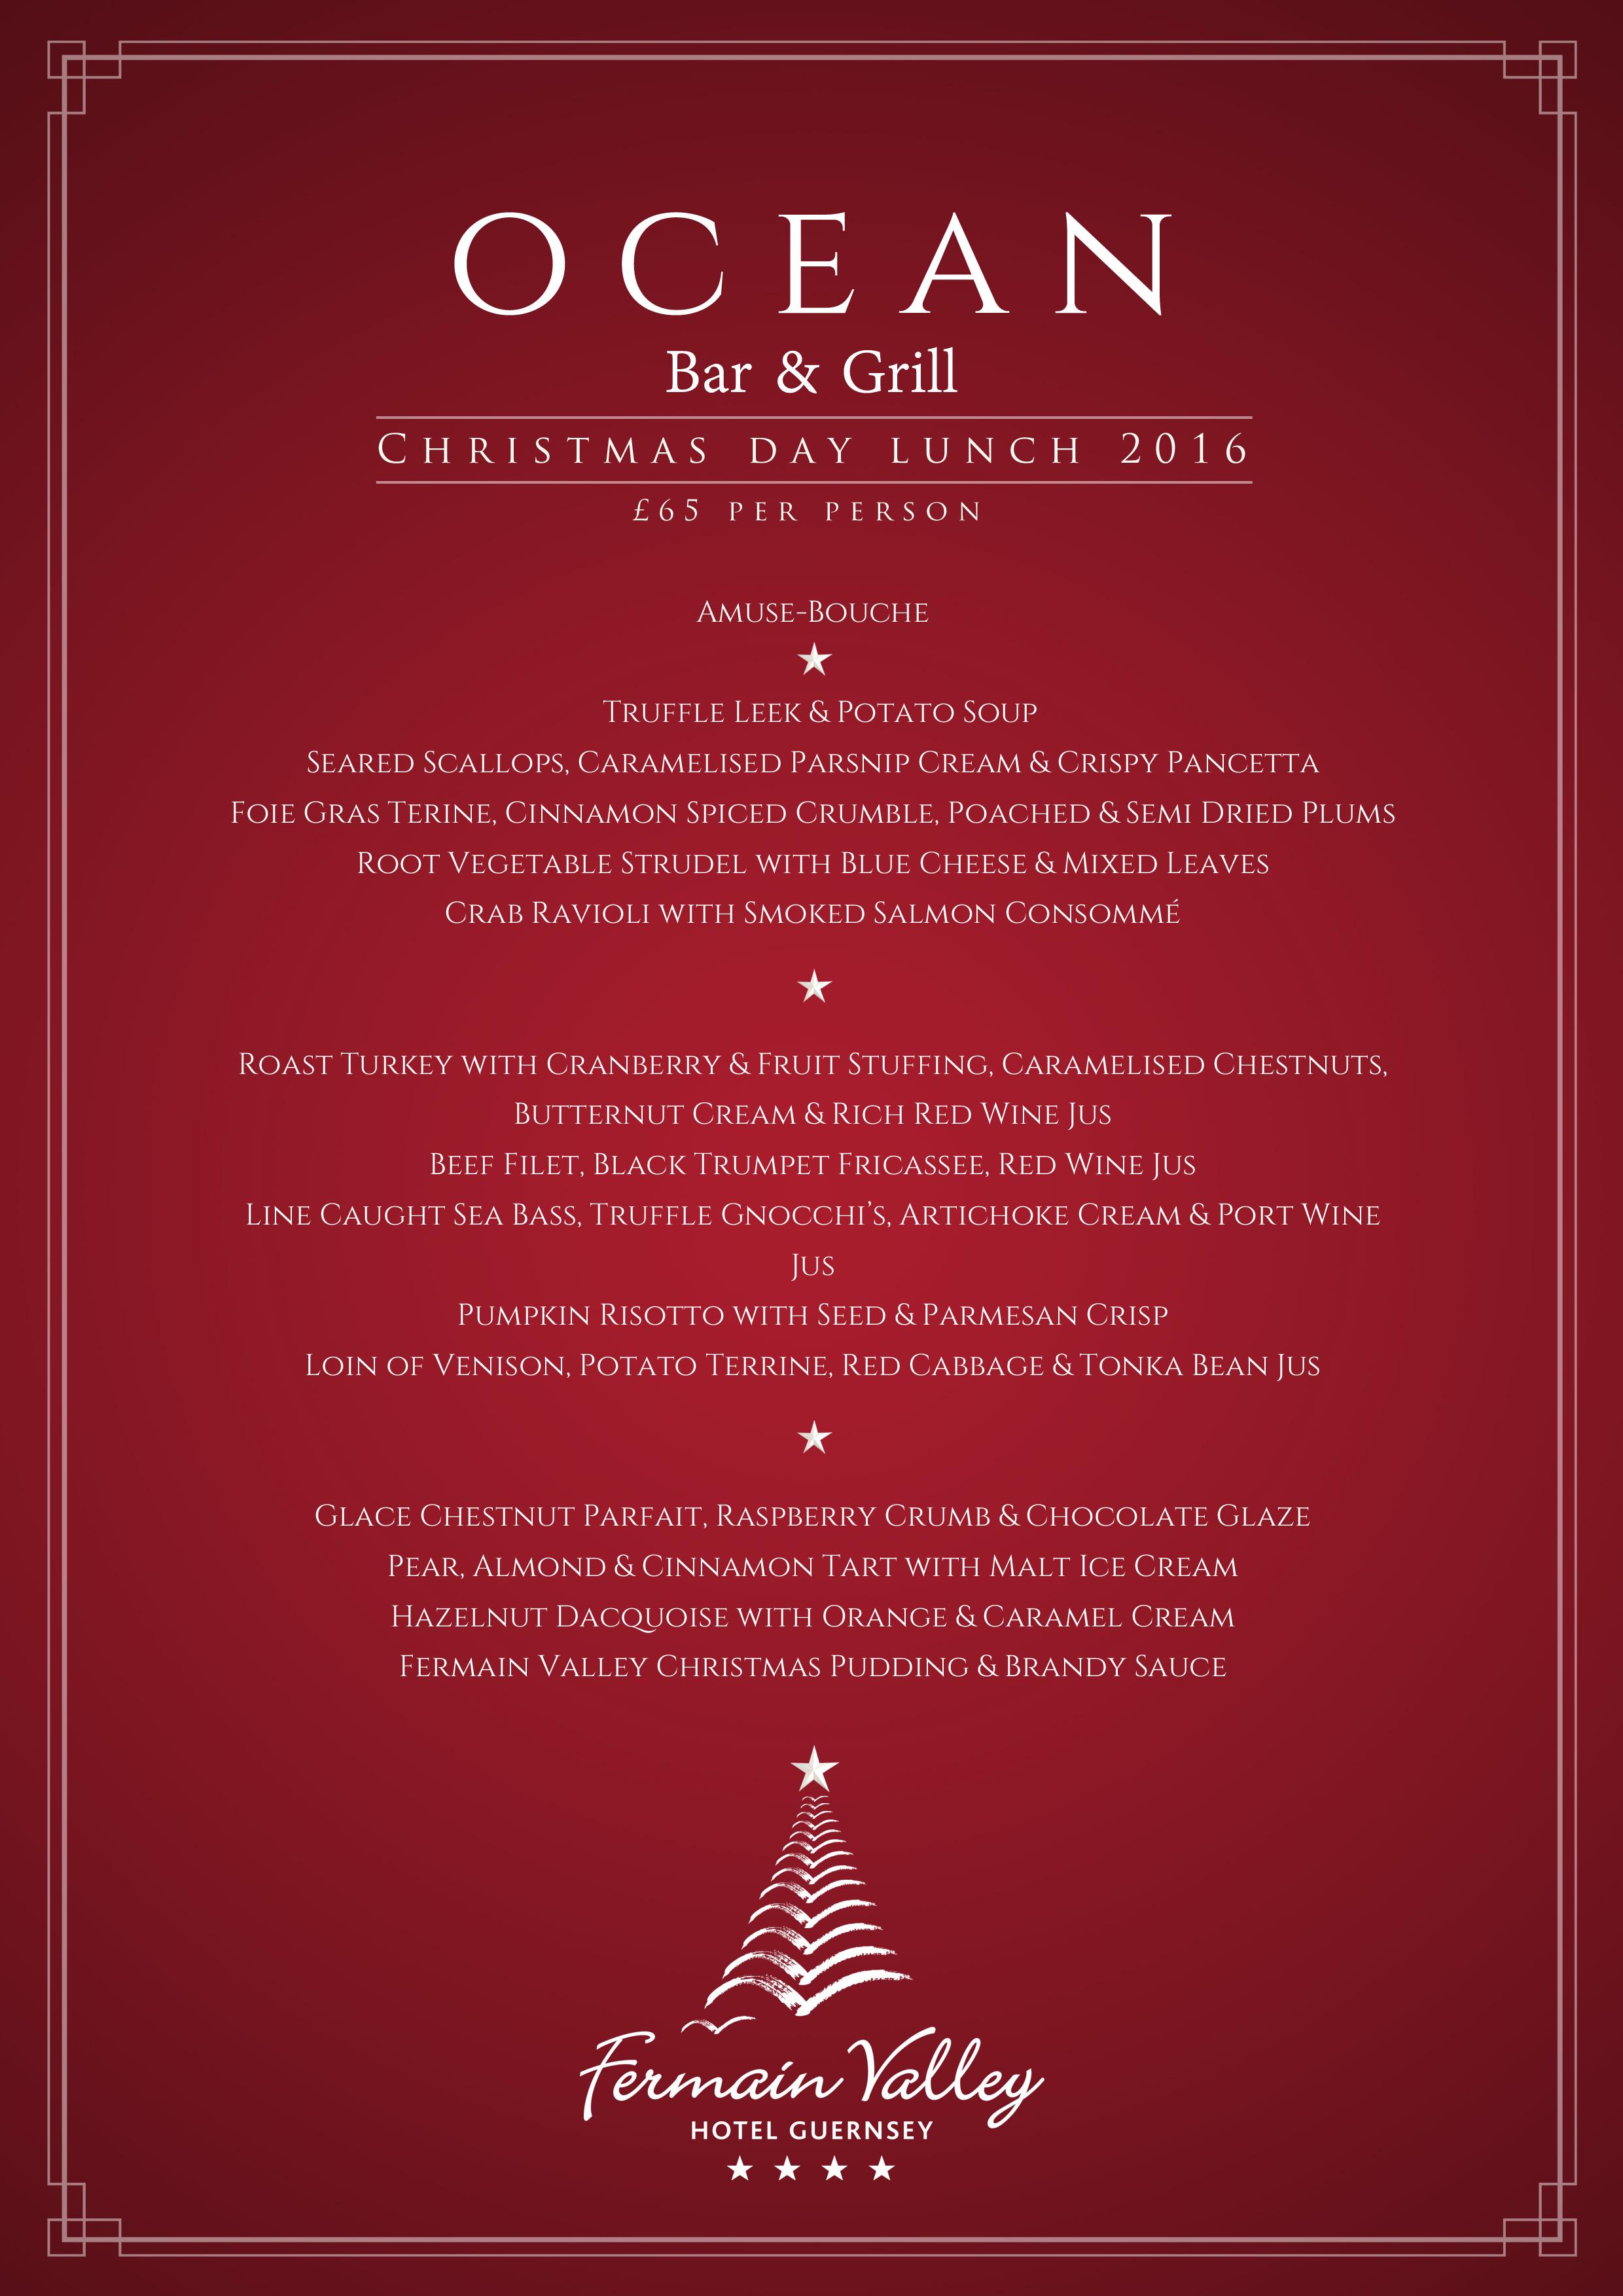 httpswwwfermainvalleycomwp contentuploads201609christmas menu 2016 jpg - When Is Christmas Day 2016